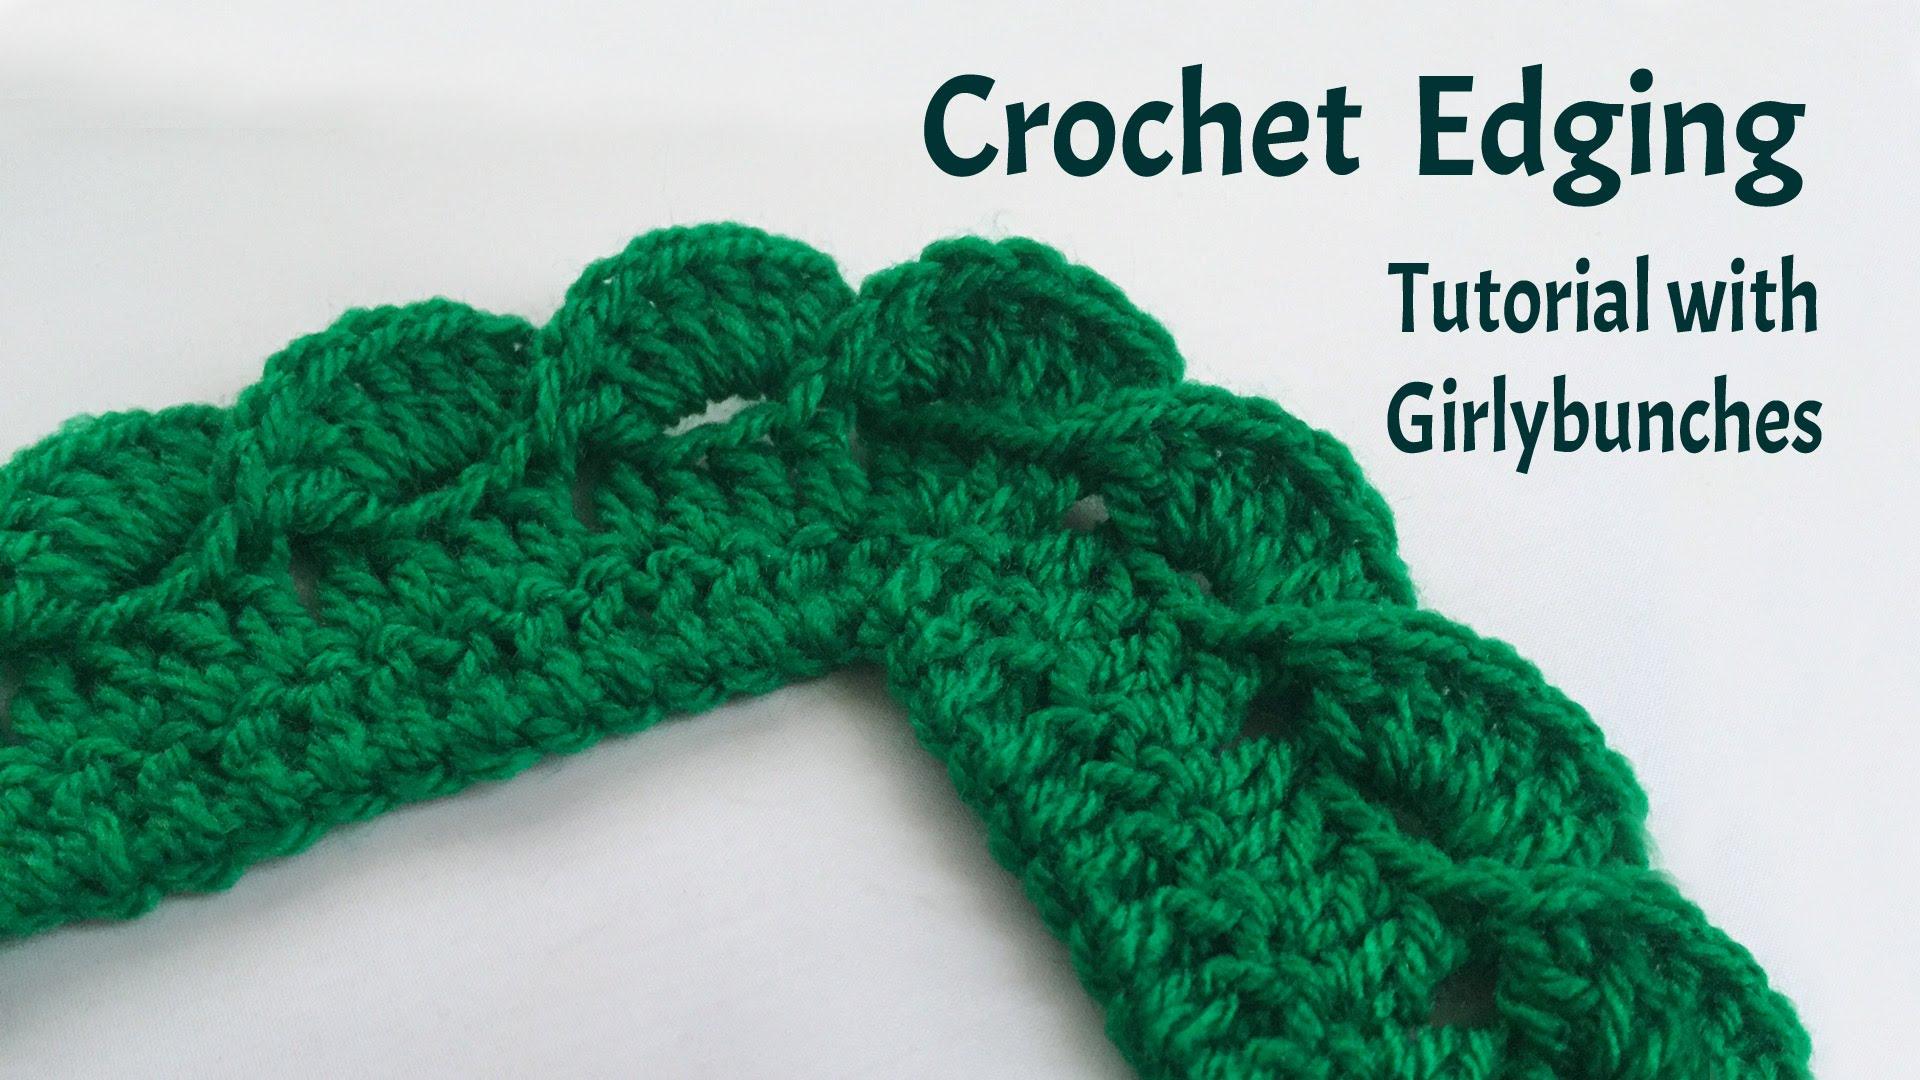 crochet edging crochet wave fan edging - tutorial | girlybunches - youtube qxnnukk